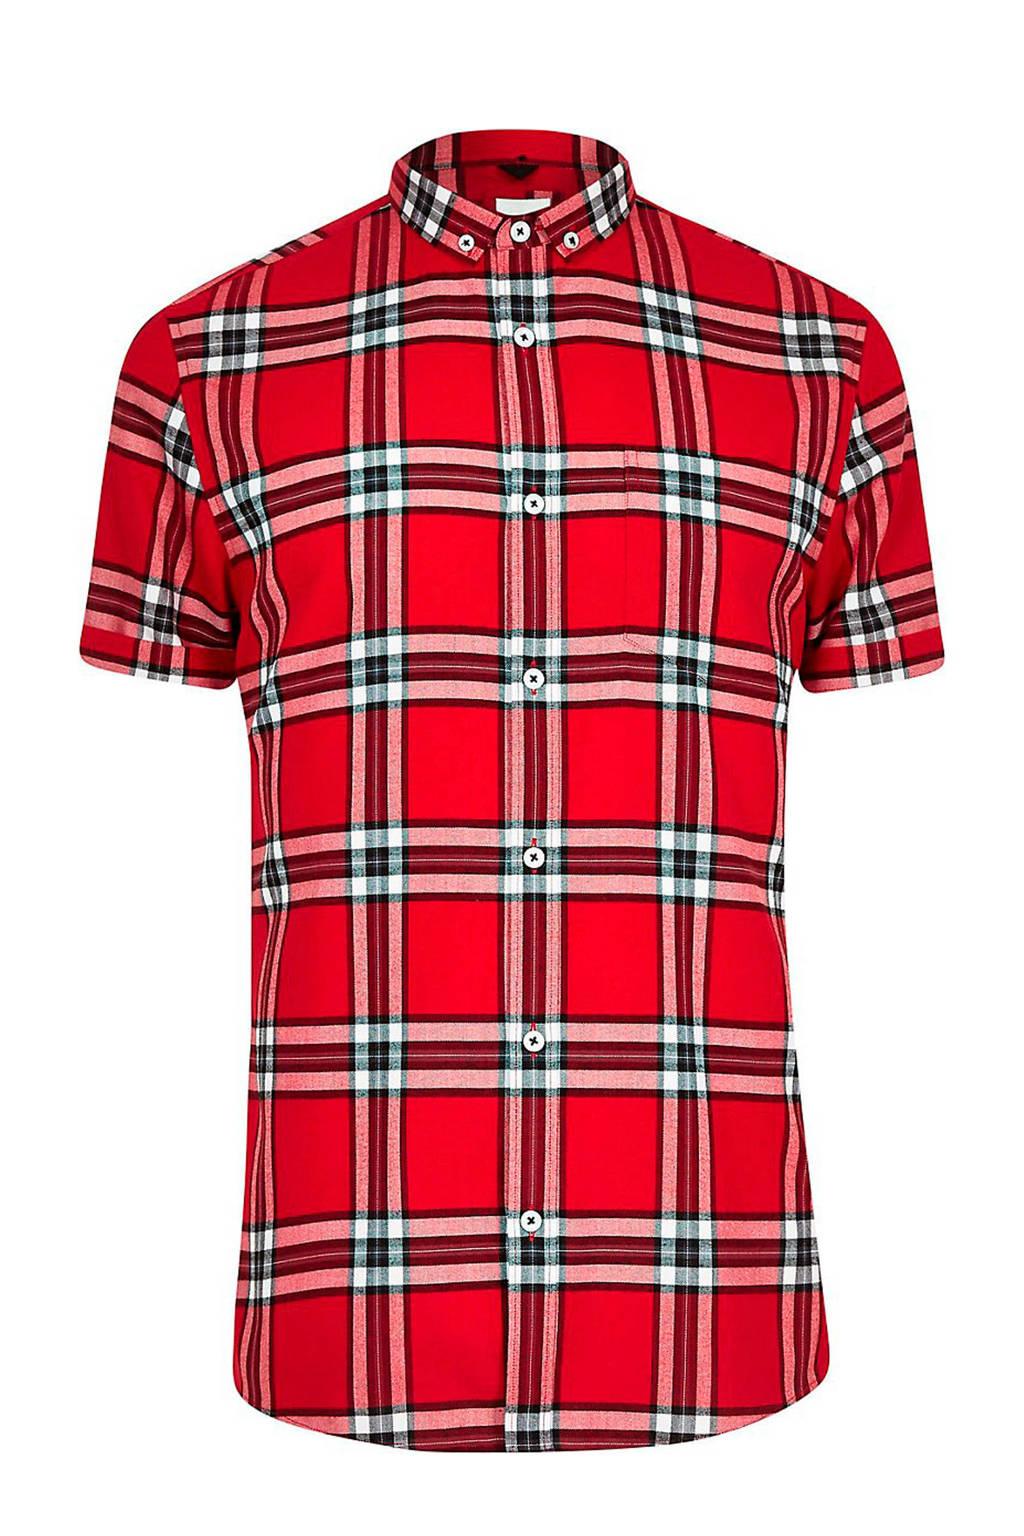 Overhemd Rood Zwart.River Island Overhemd Ruitdessin Rood Wehkamp